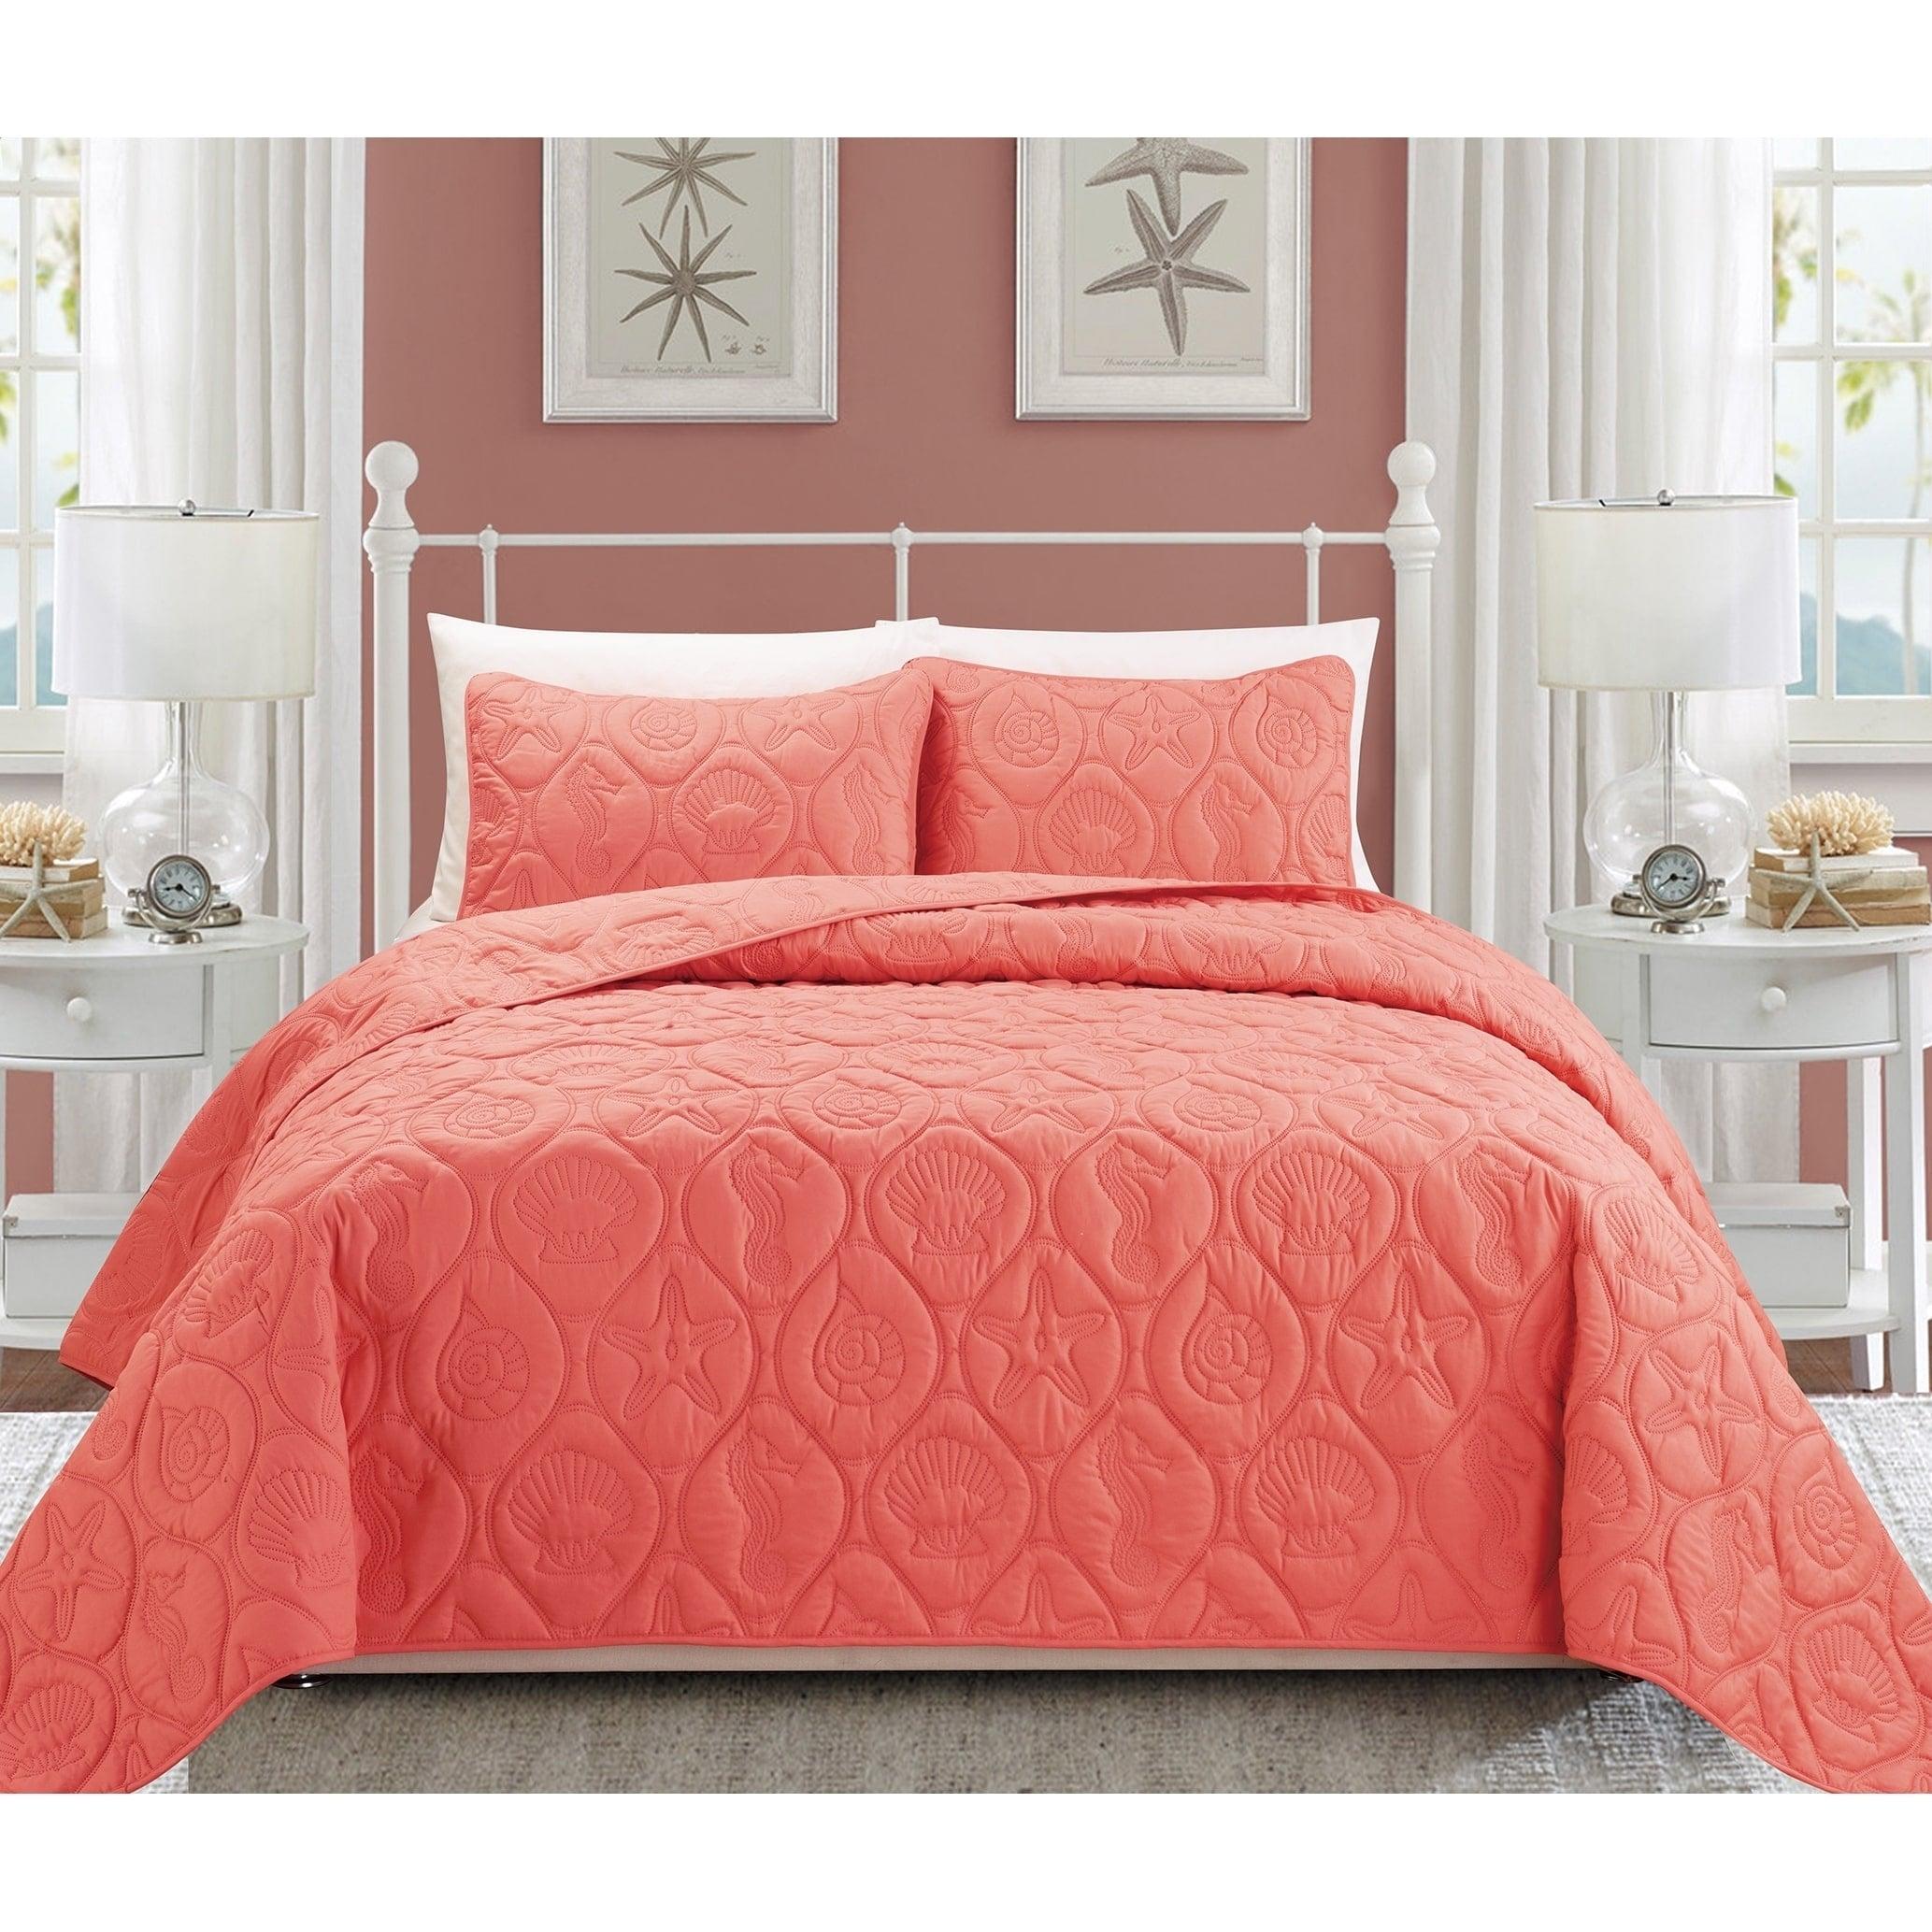 EverRouge Oversized Coral (Pink) 3-piece King Size Bedspr...